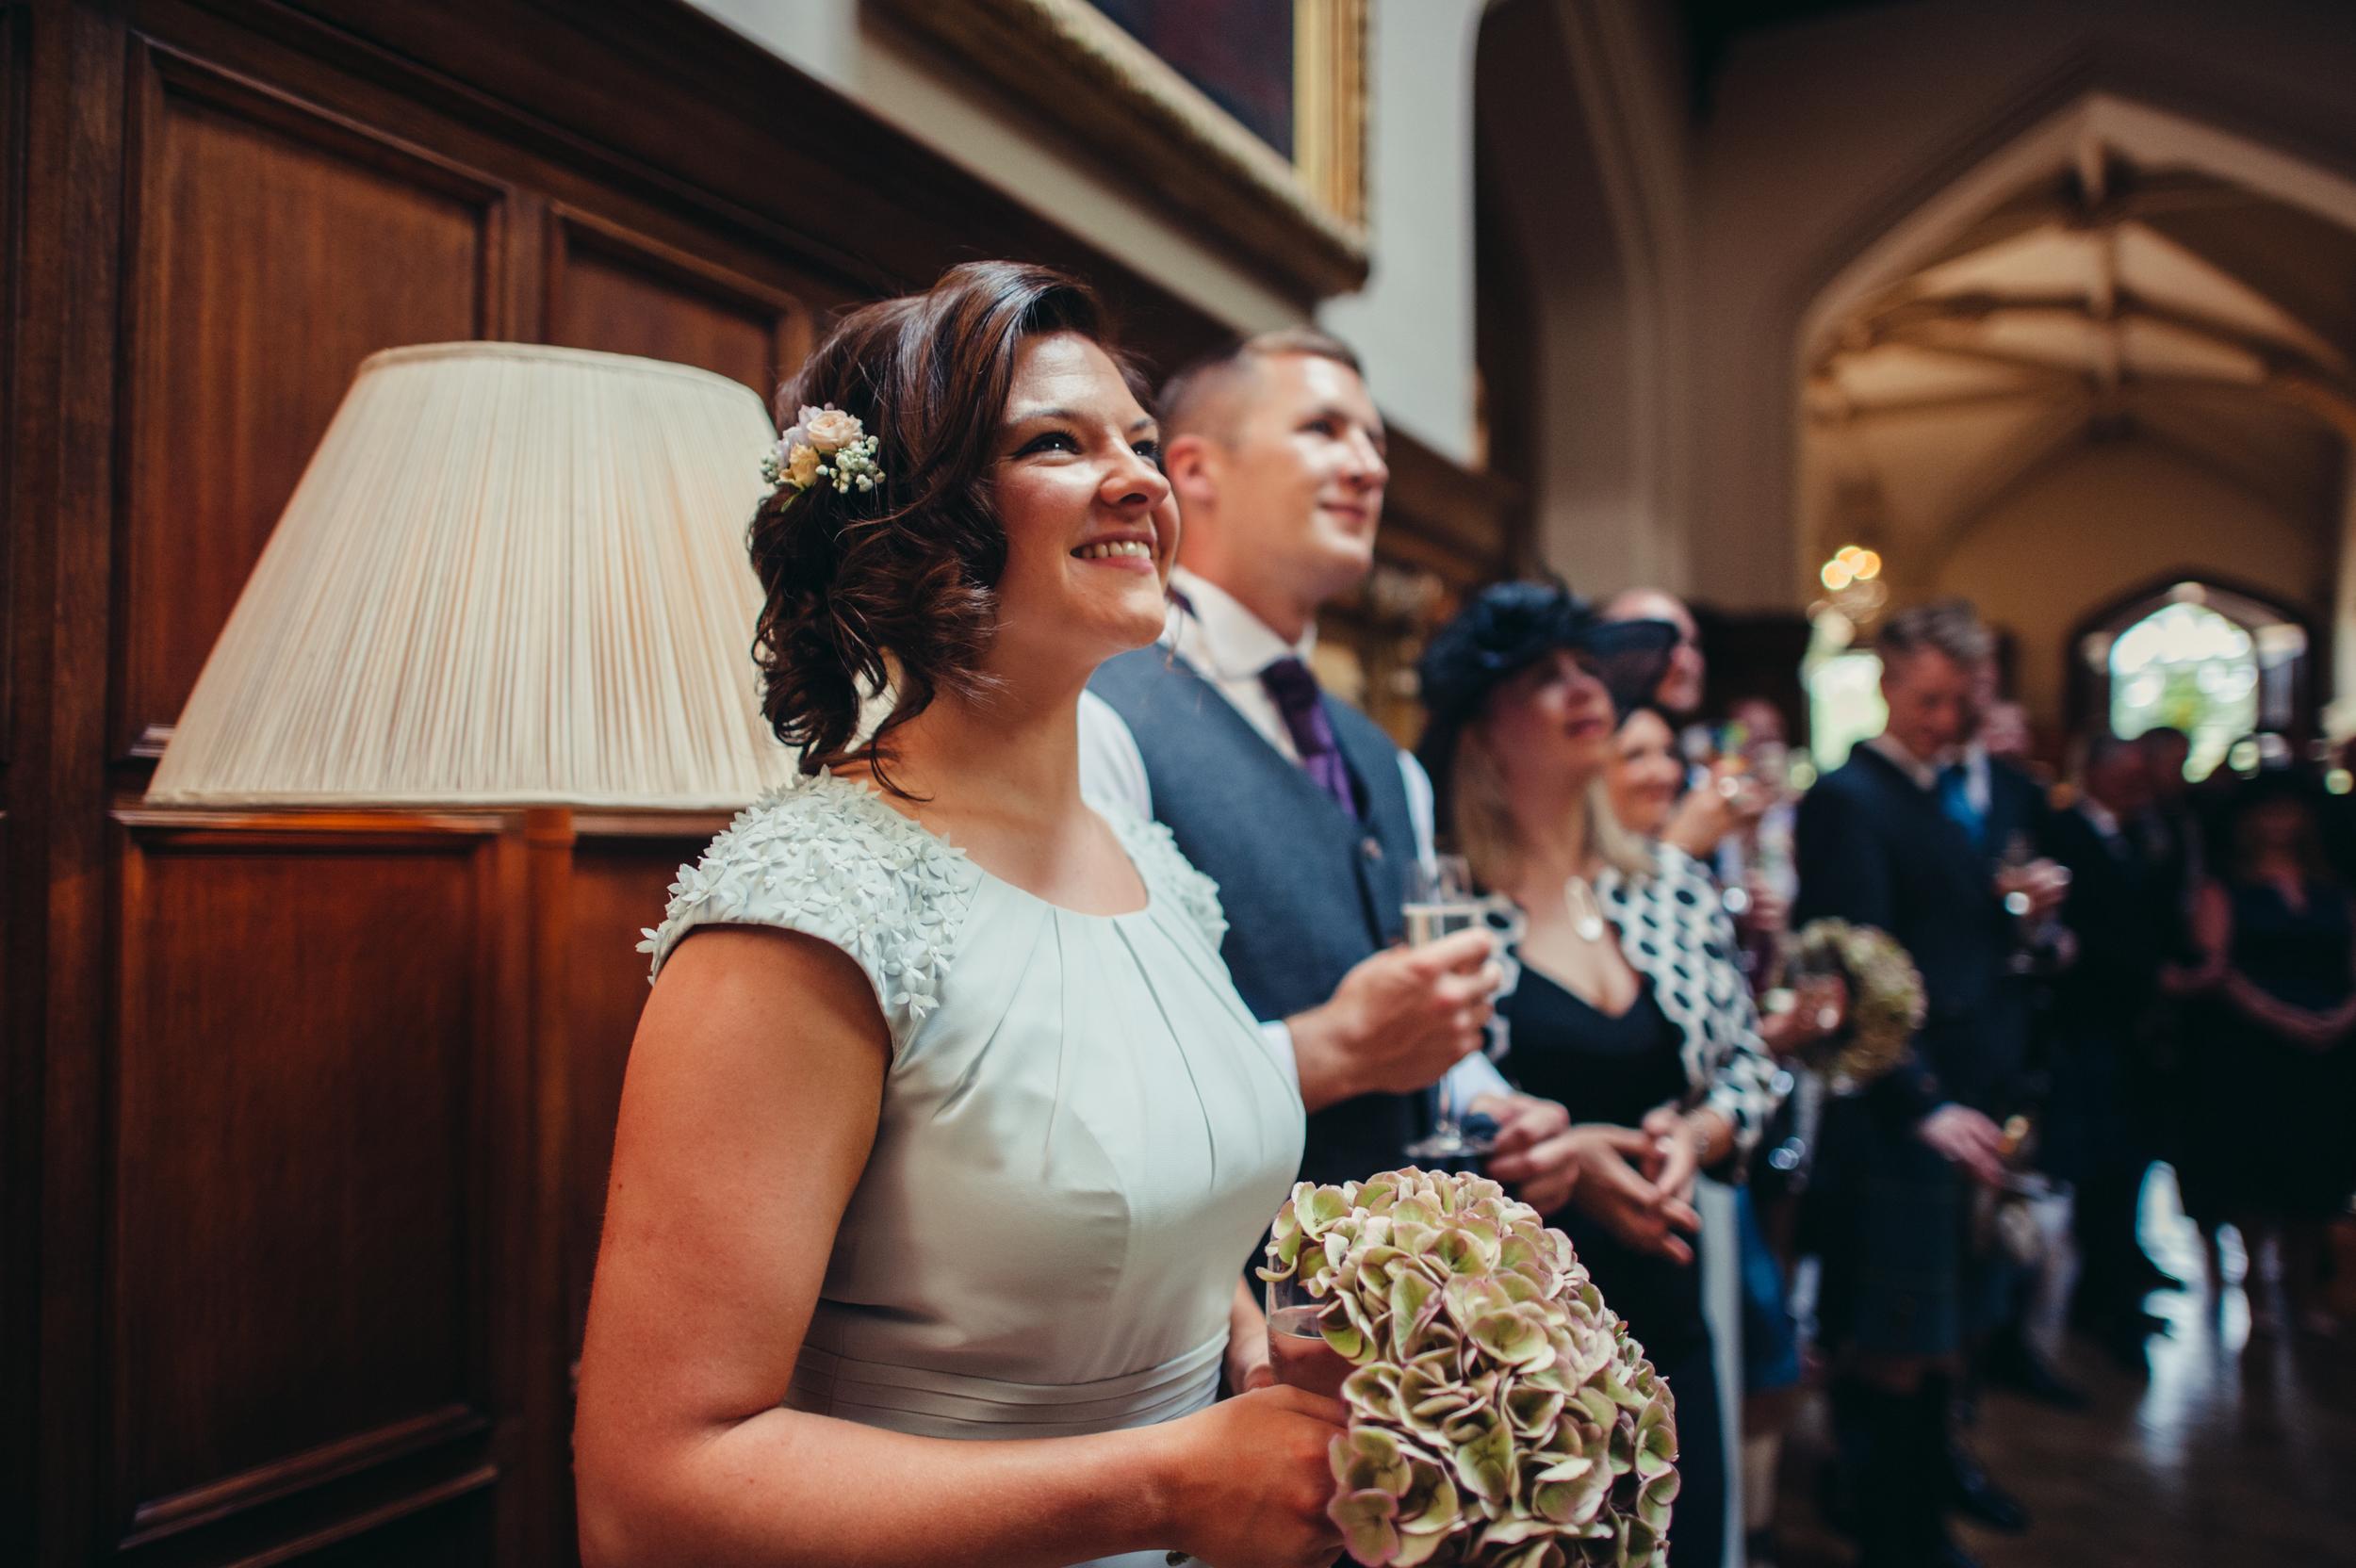 0122-lisa-devine-alternative-creative-wedding-photography-glasgow-edinburgh.JPG